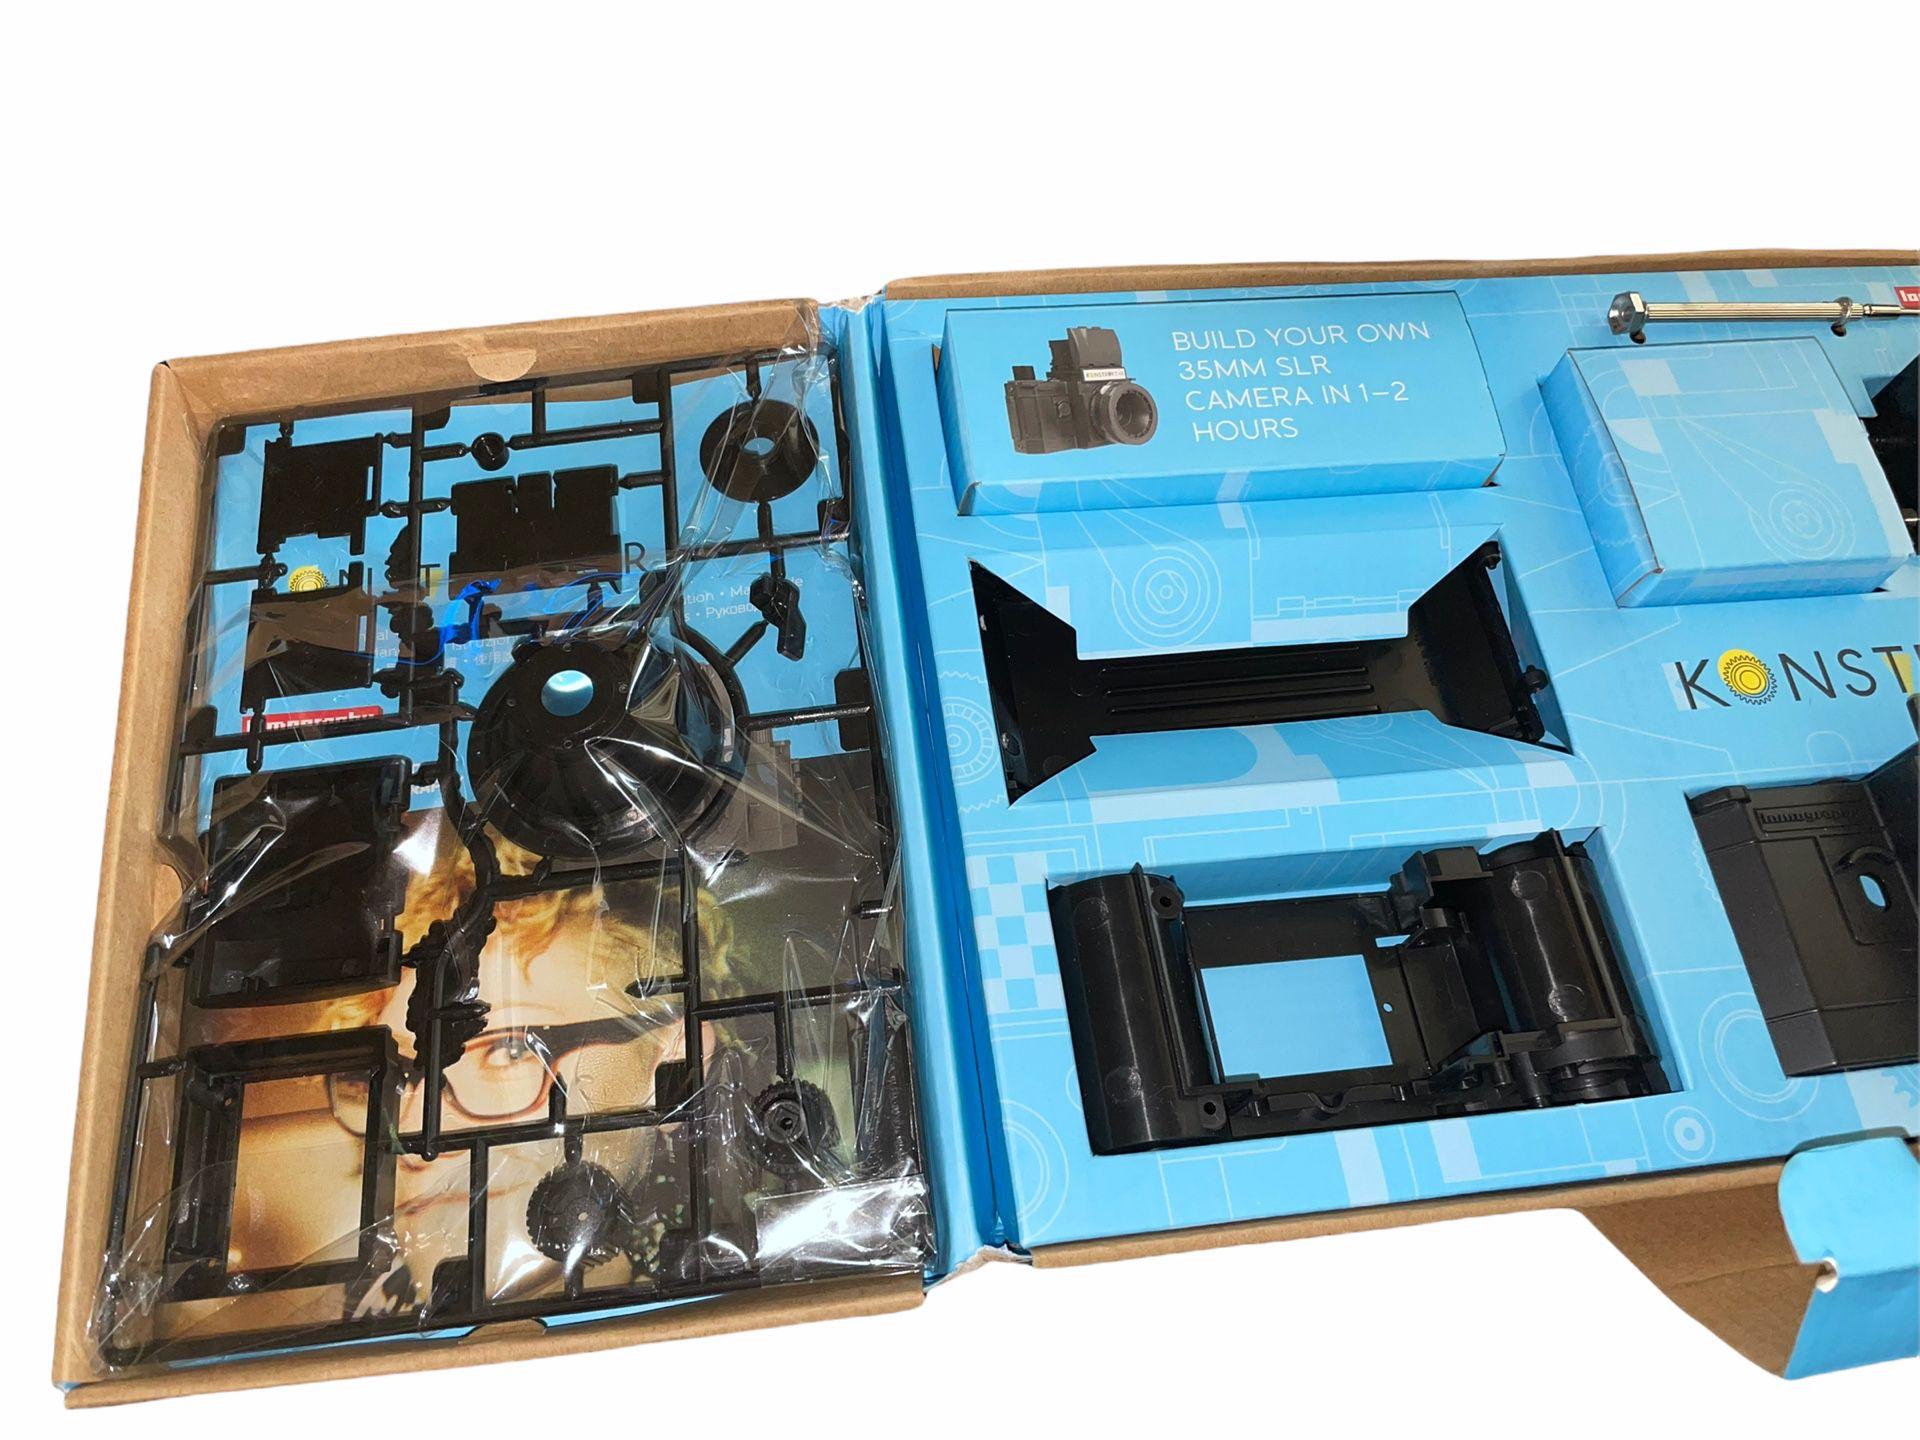 NIB Lomography Konstruktor F Build Your Own 35mm Film Camera